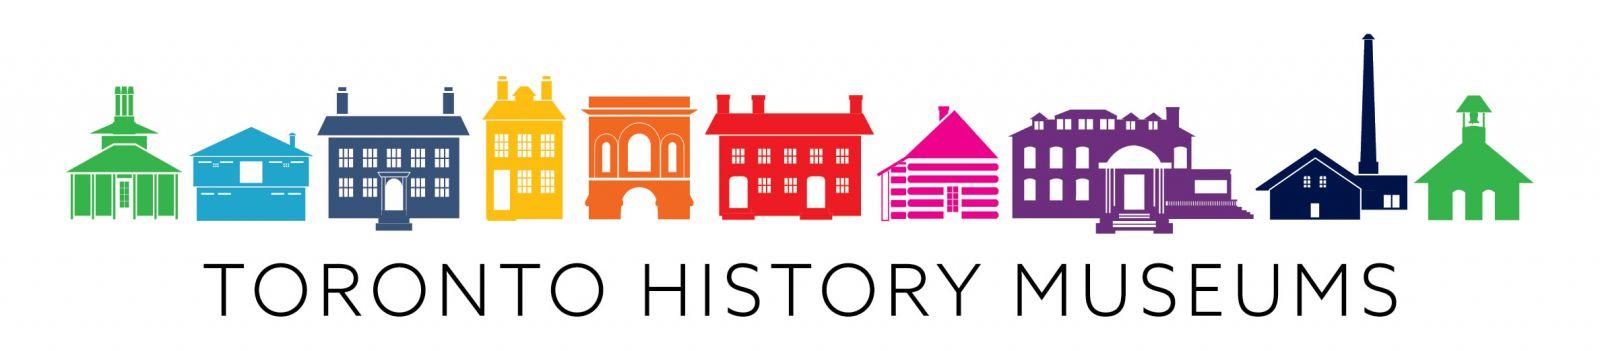 Toronto History Museums